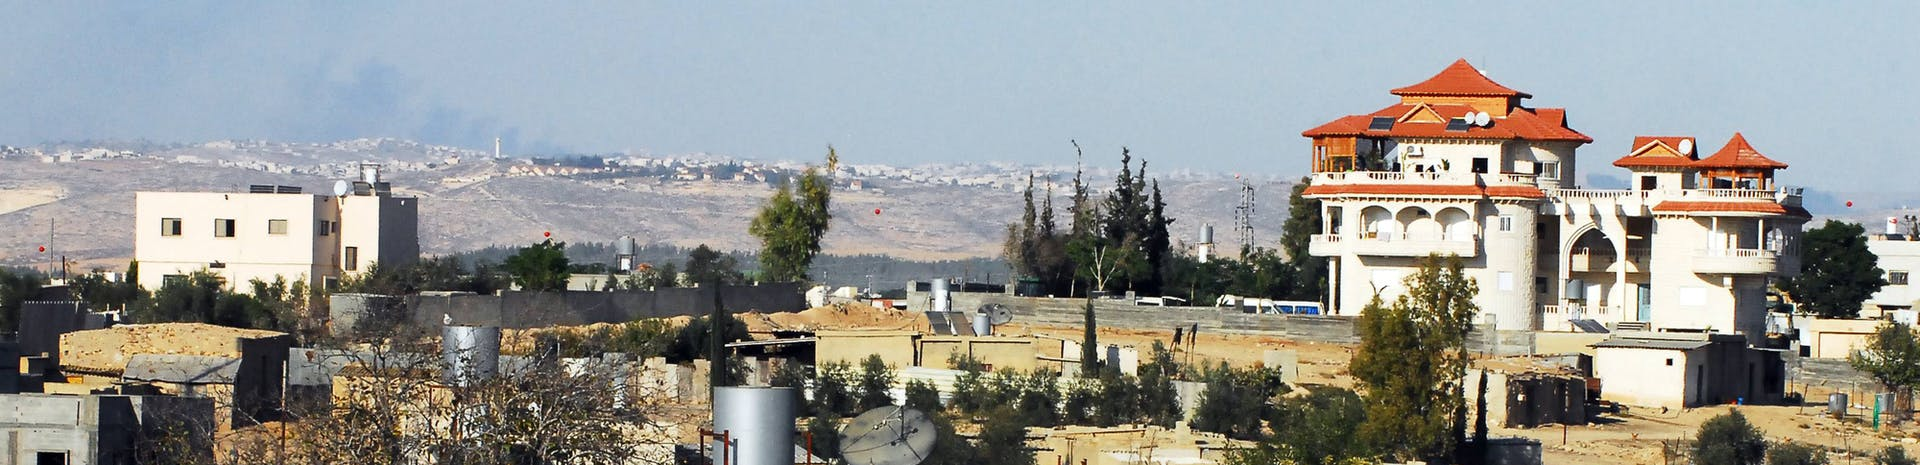 Picture of Beersheba